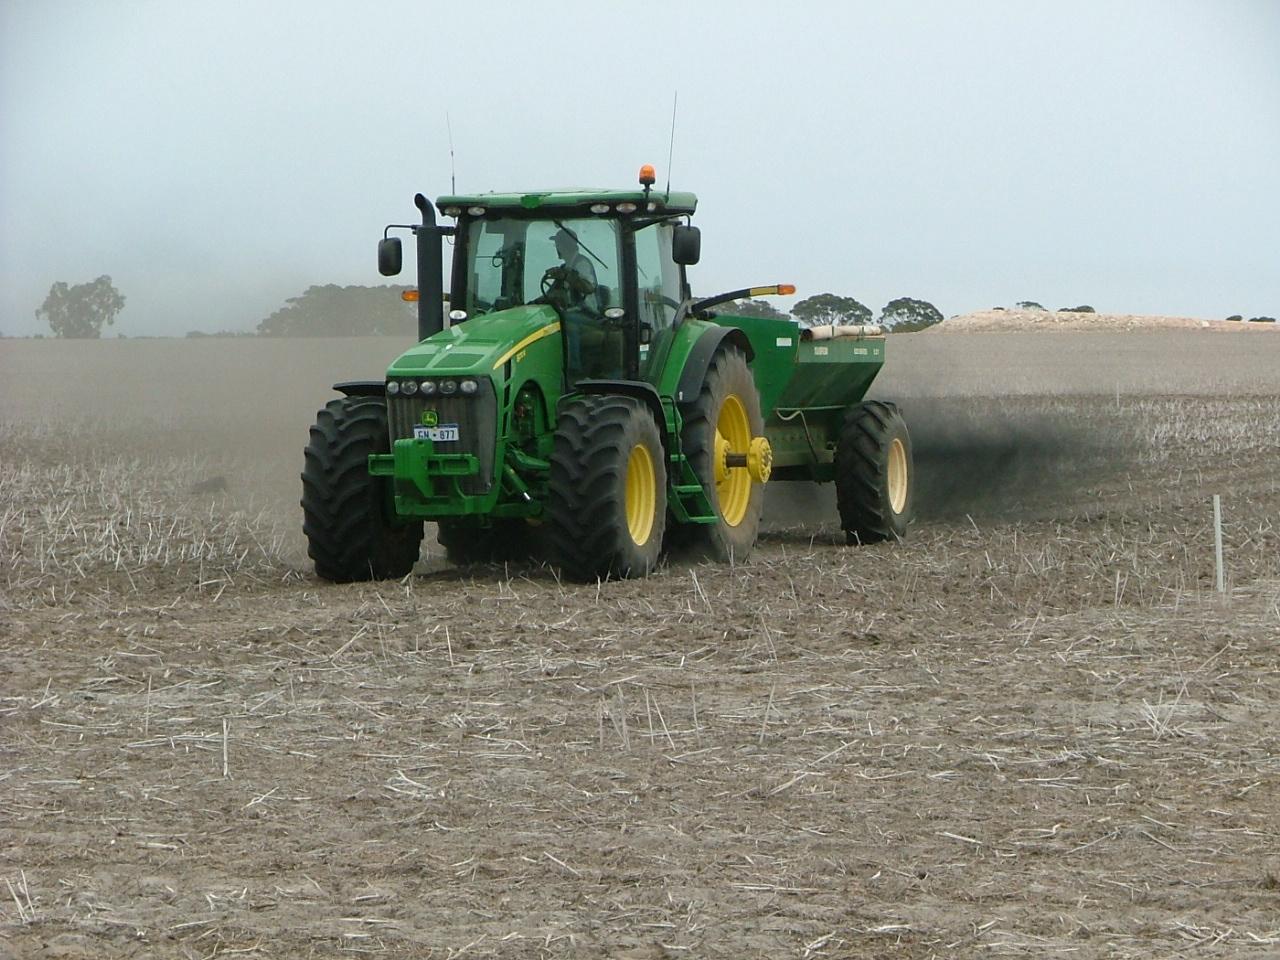 spreading biochar onto soil with a fertiliser spreader